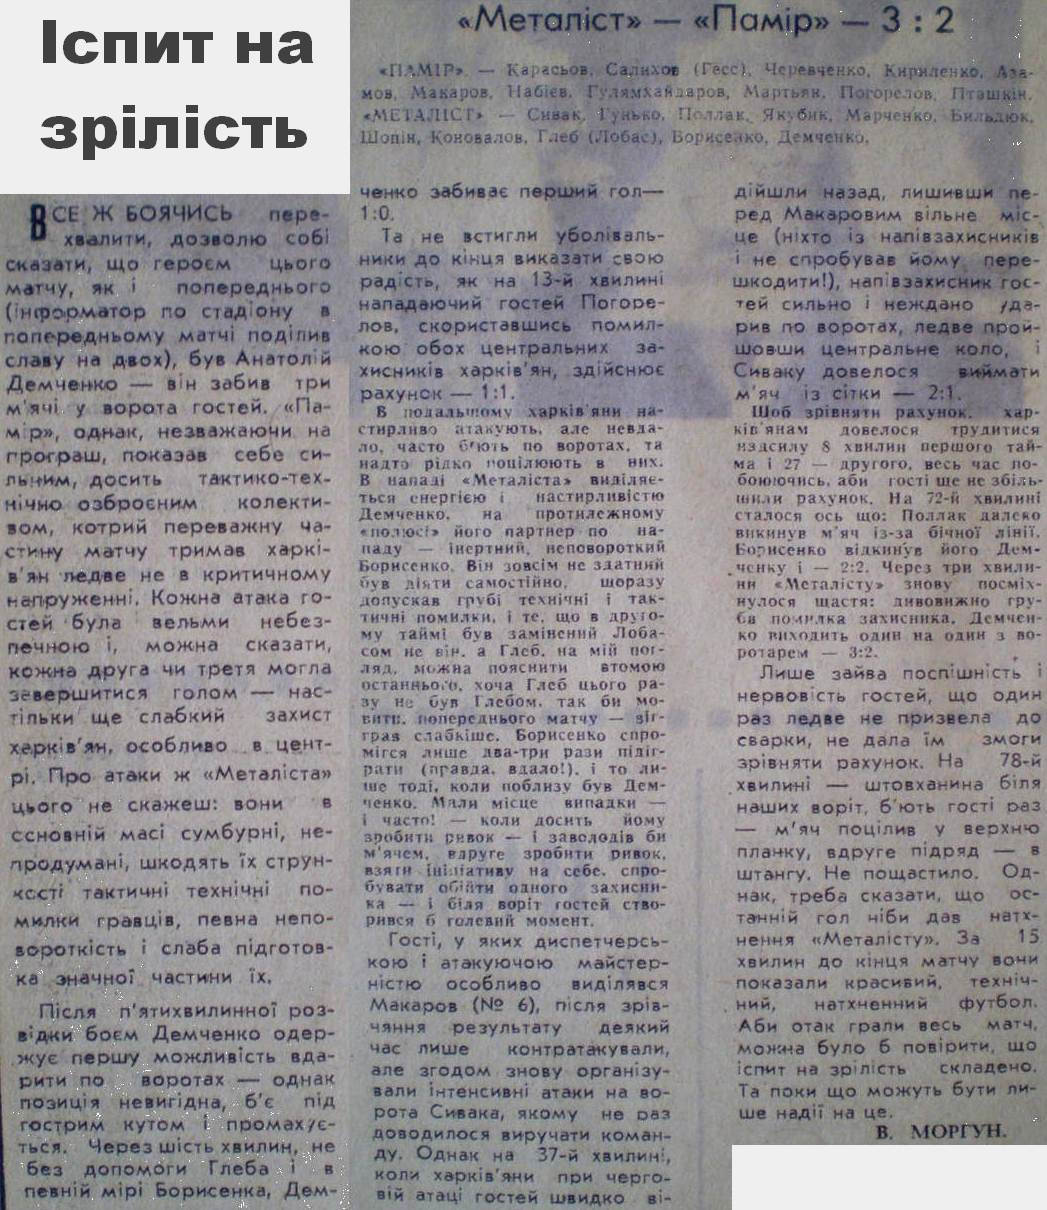 [Изображение: 1973-06-08_MKh-PD_3-2.jpg]